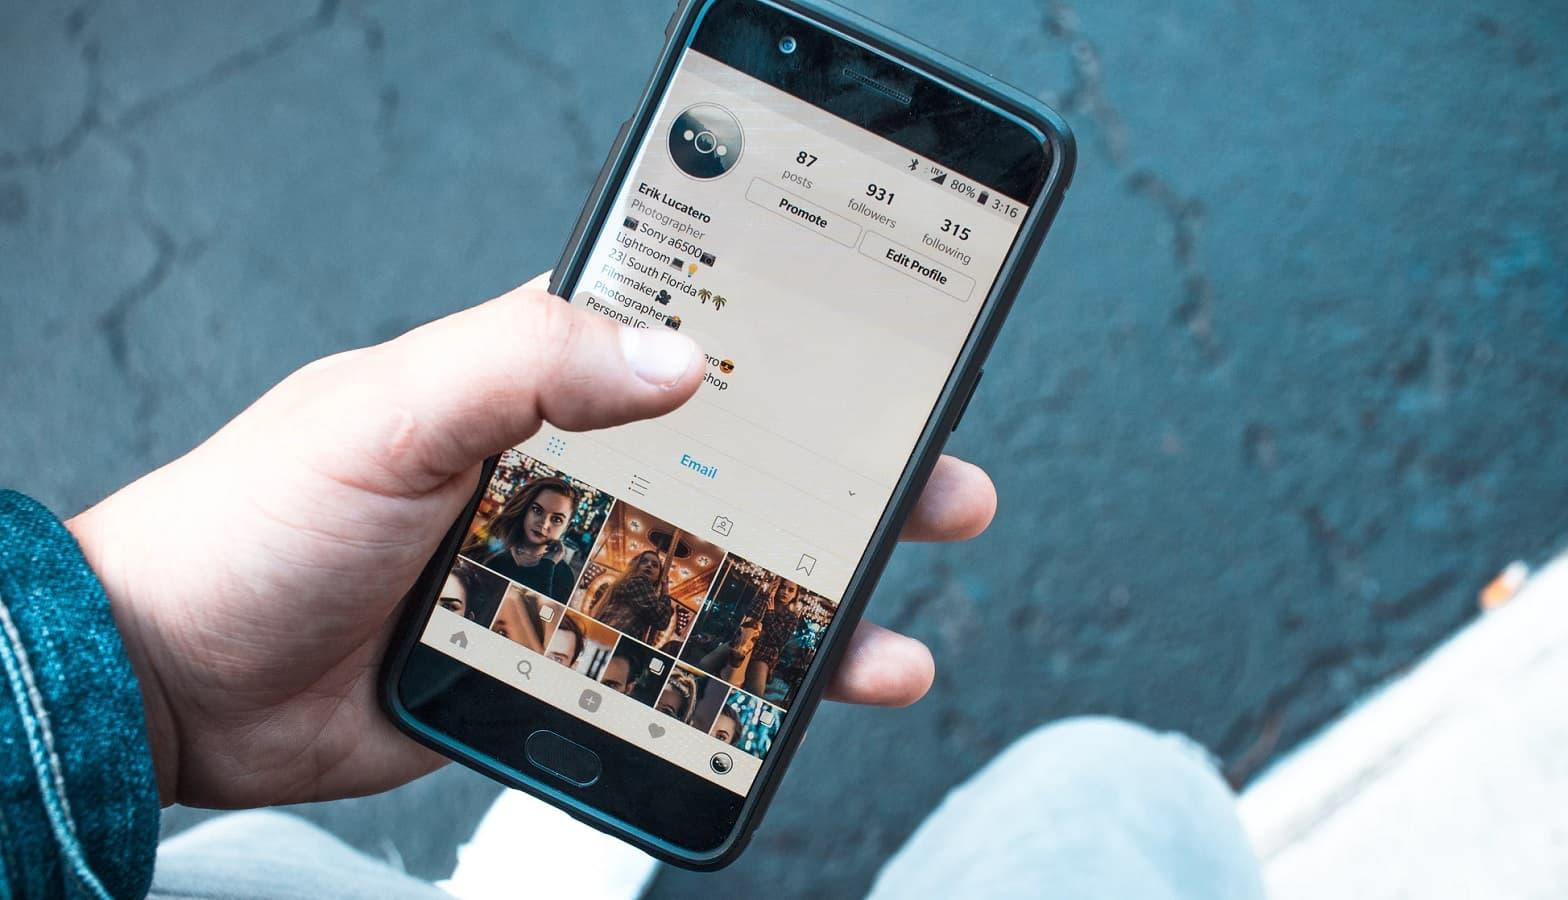 instagram feed on phone